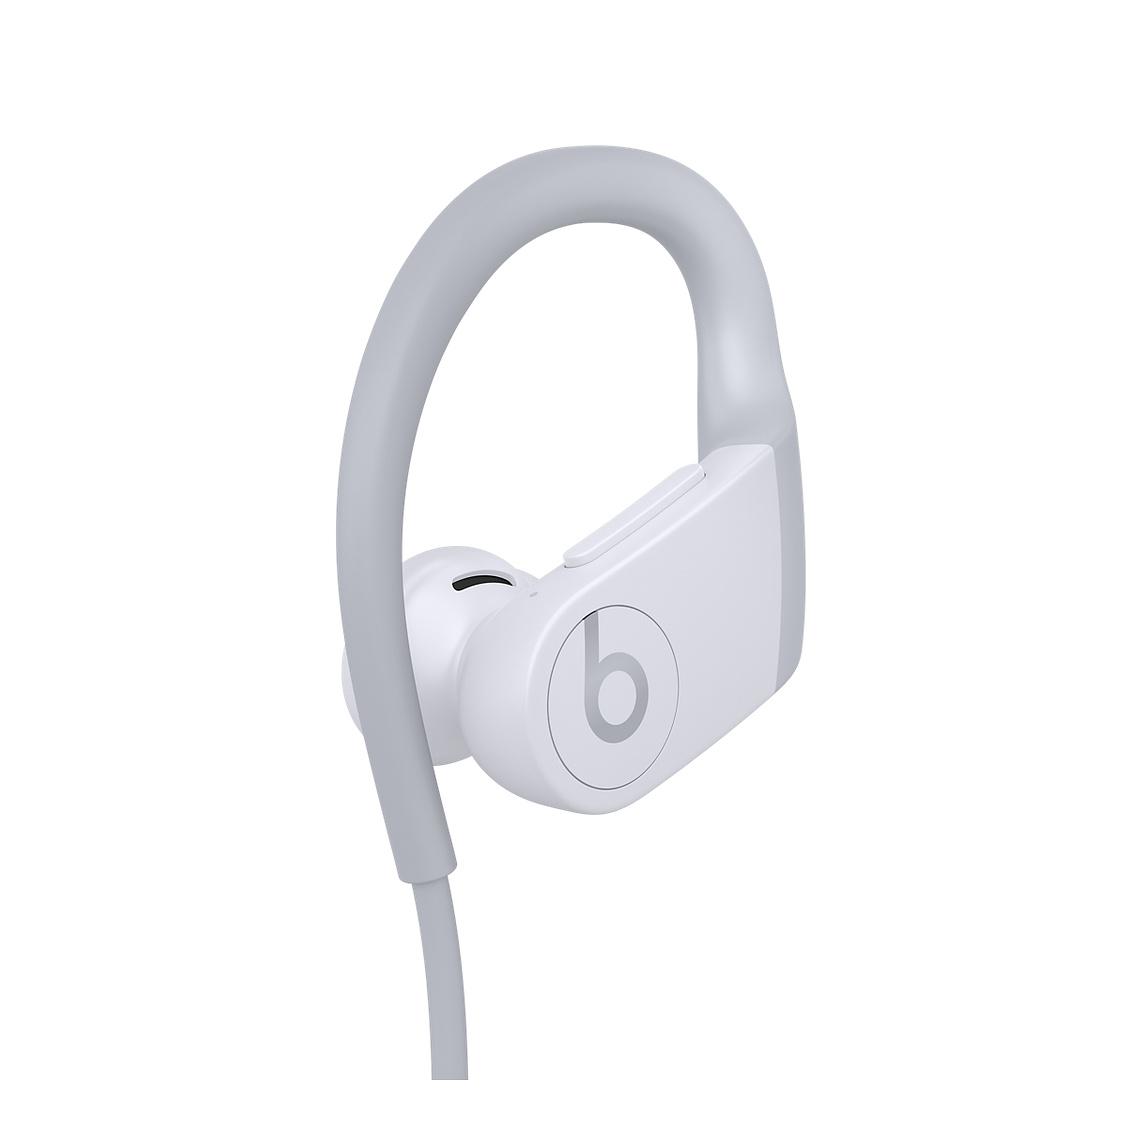 - Audifono In Ear Powerbeats High Performance Beats Blanco 5